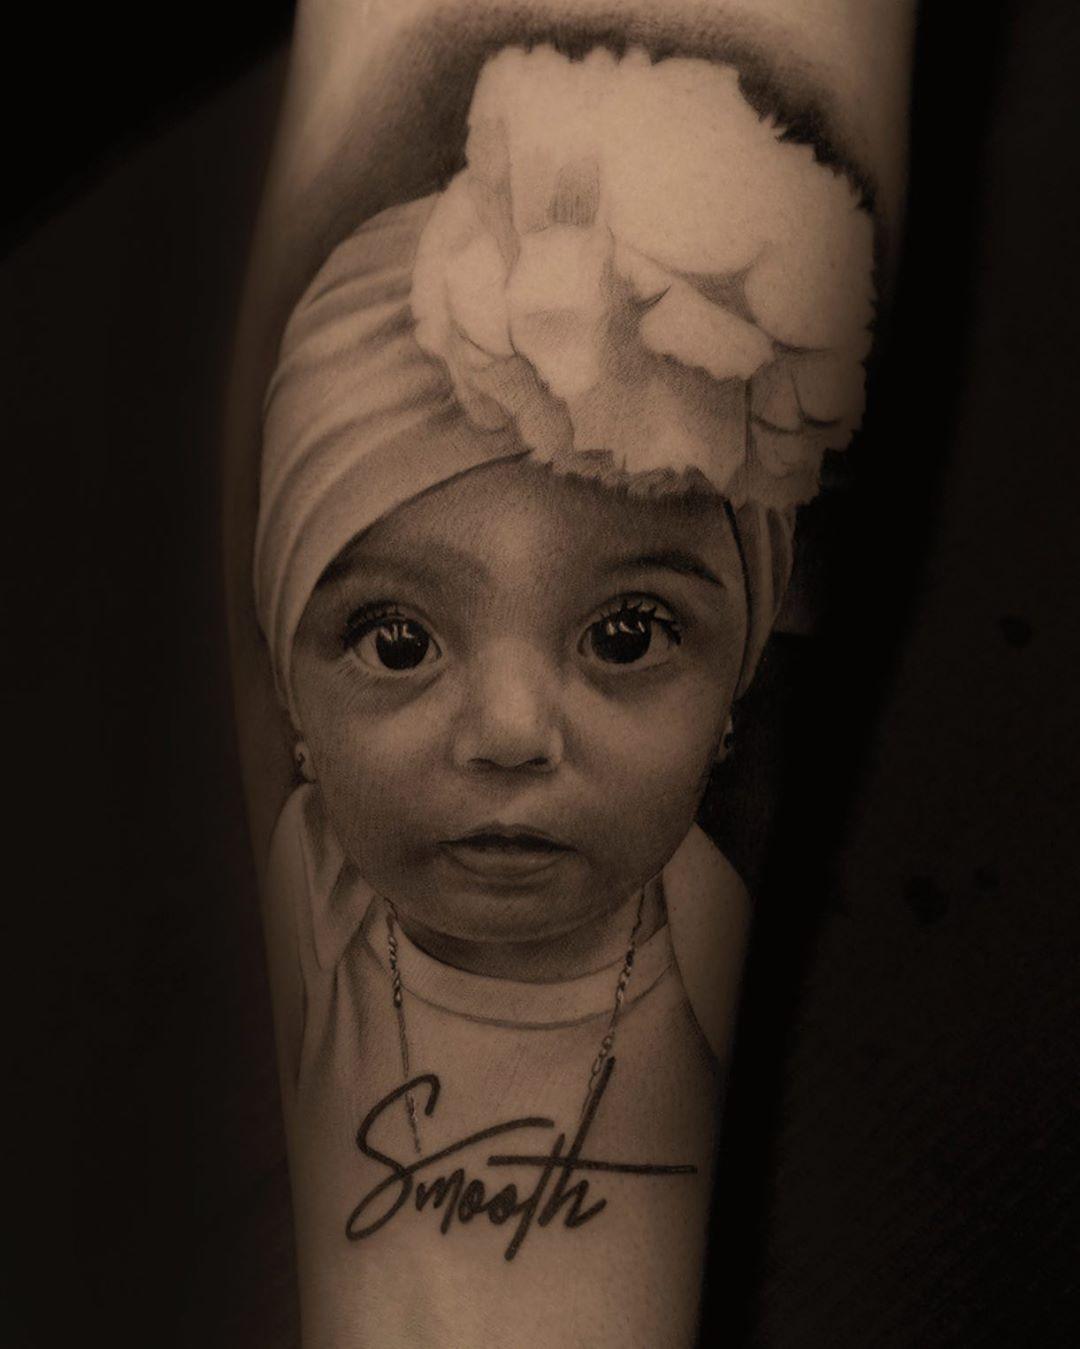 Tattoo Done With Bishoprotary 💪 At Va Tattoorealistic - Tattoos